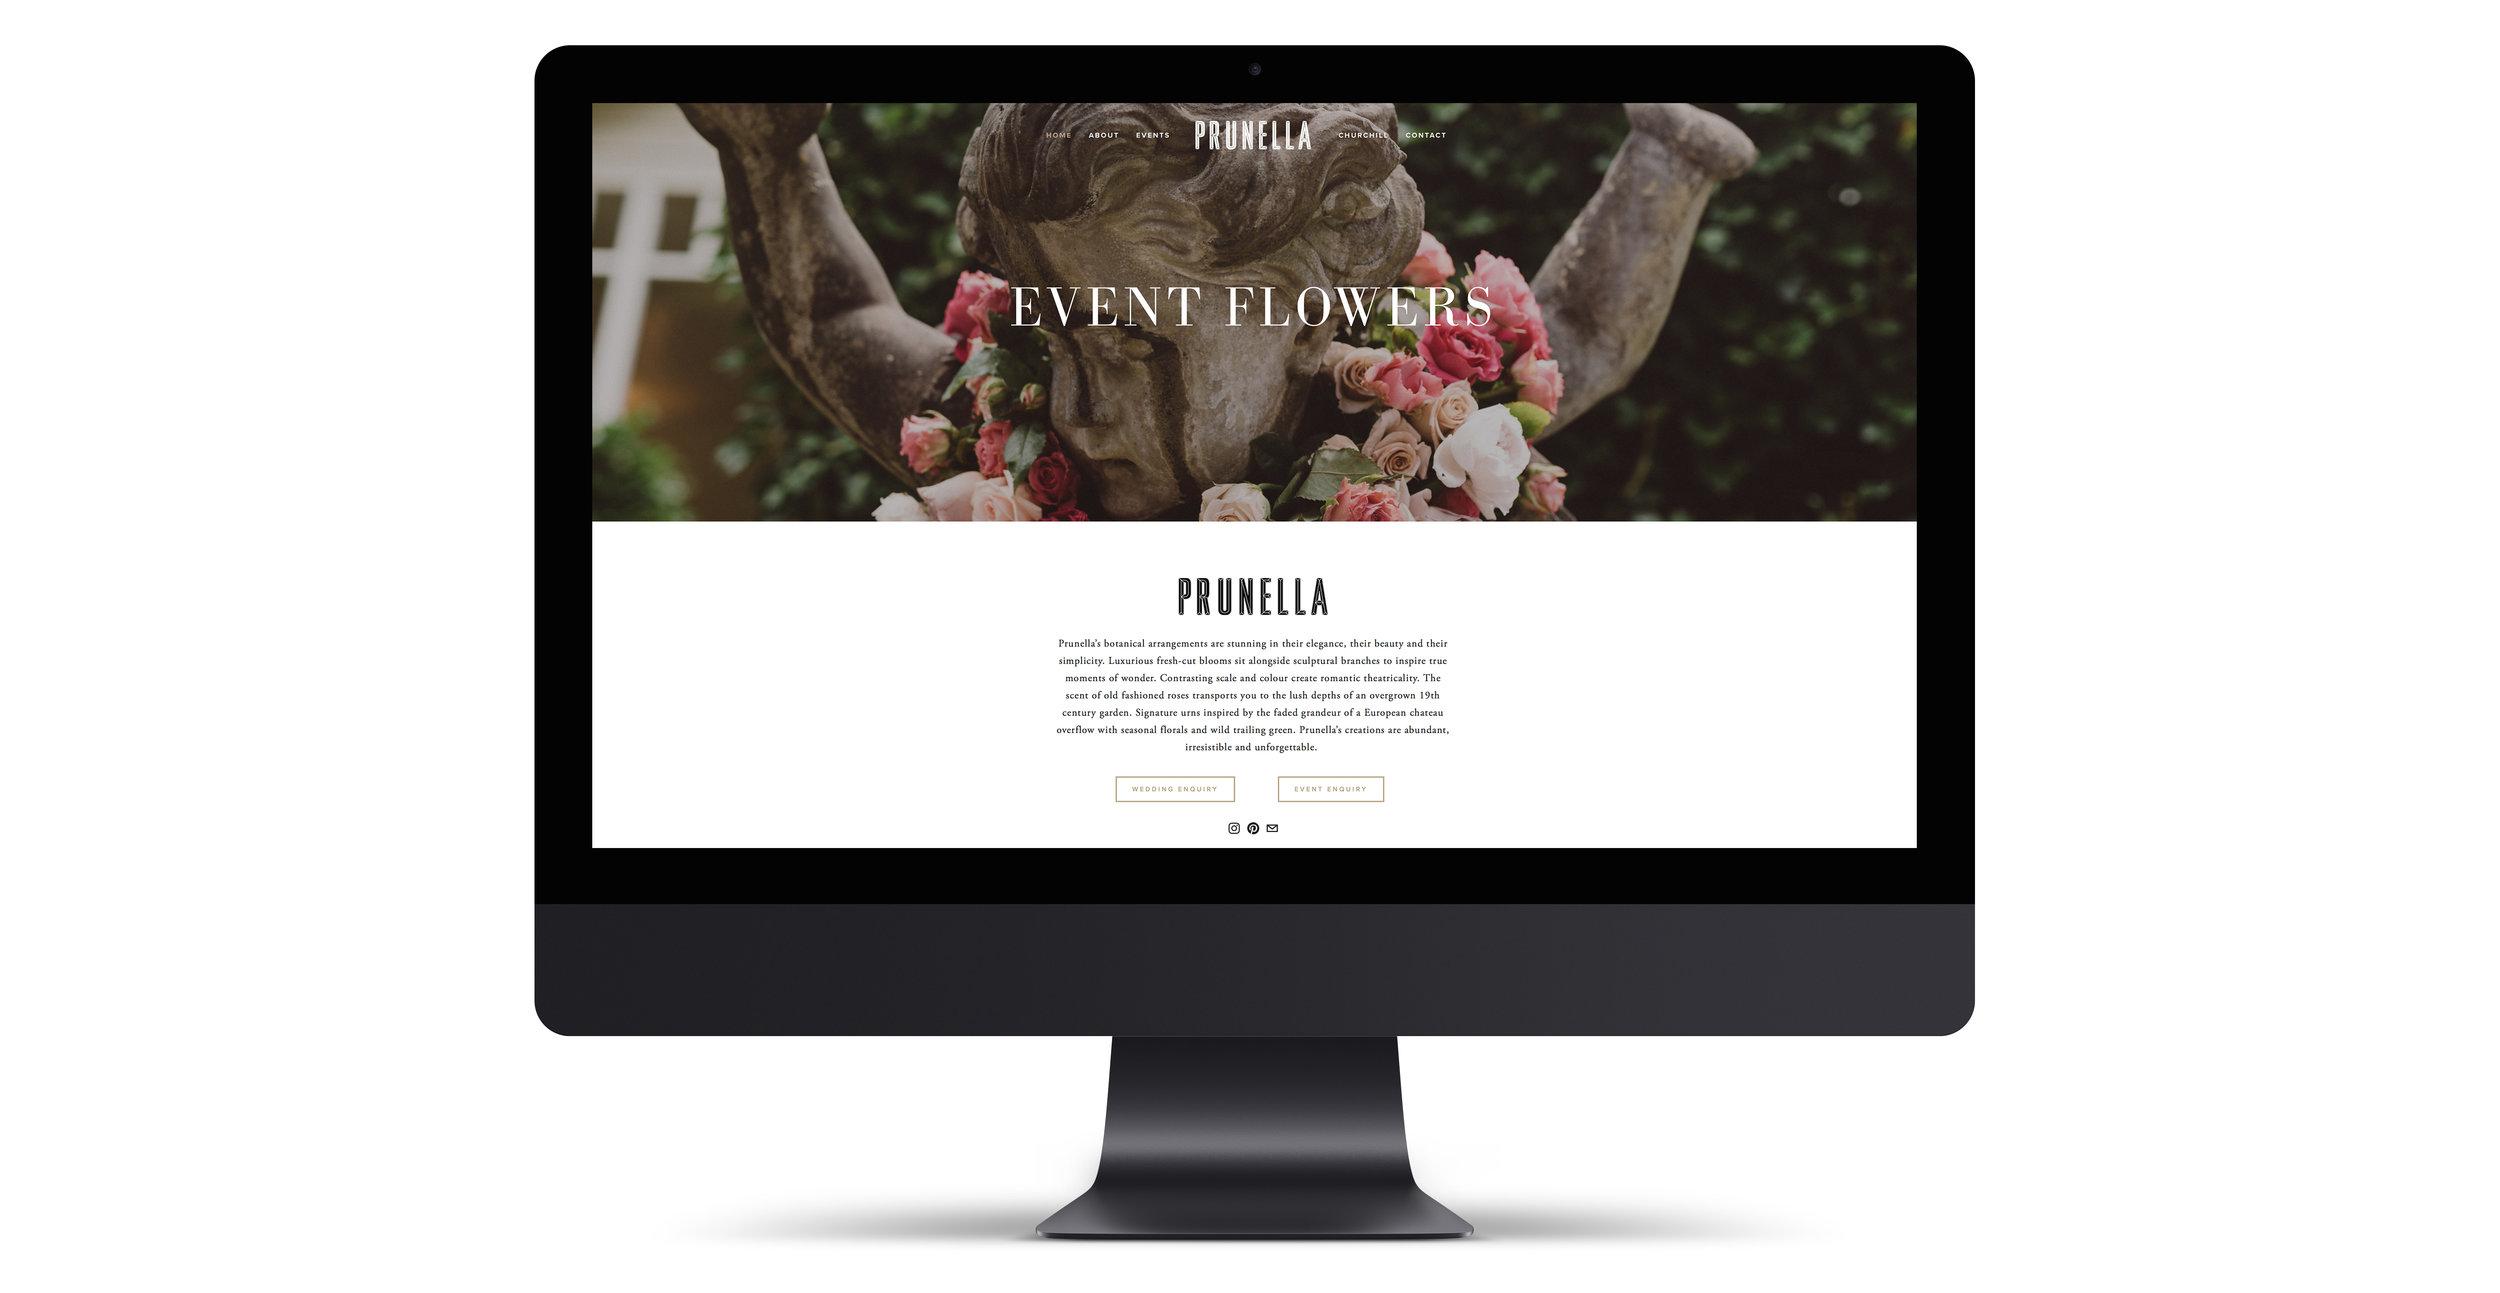 iMac-Pro-Mockup_websites_prunella.jpg